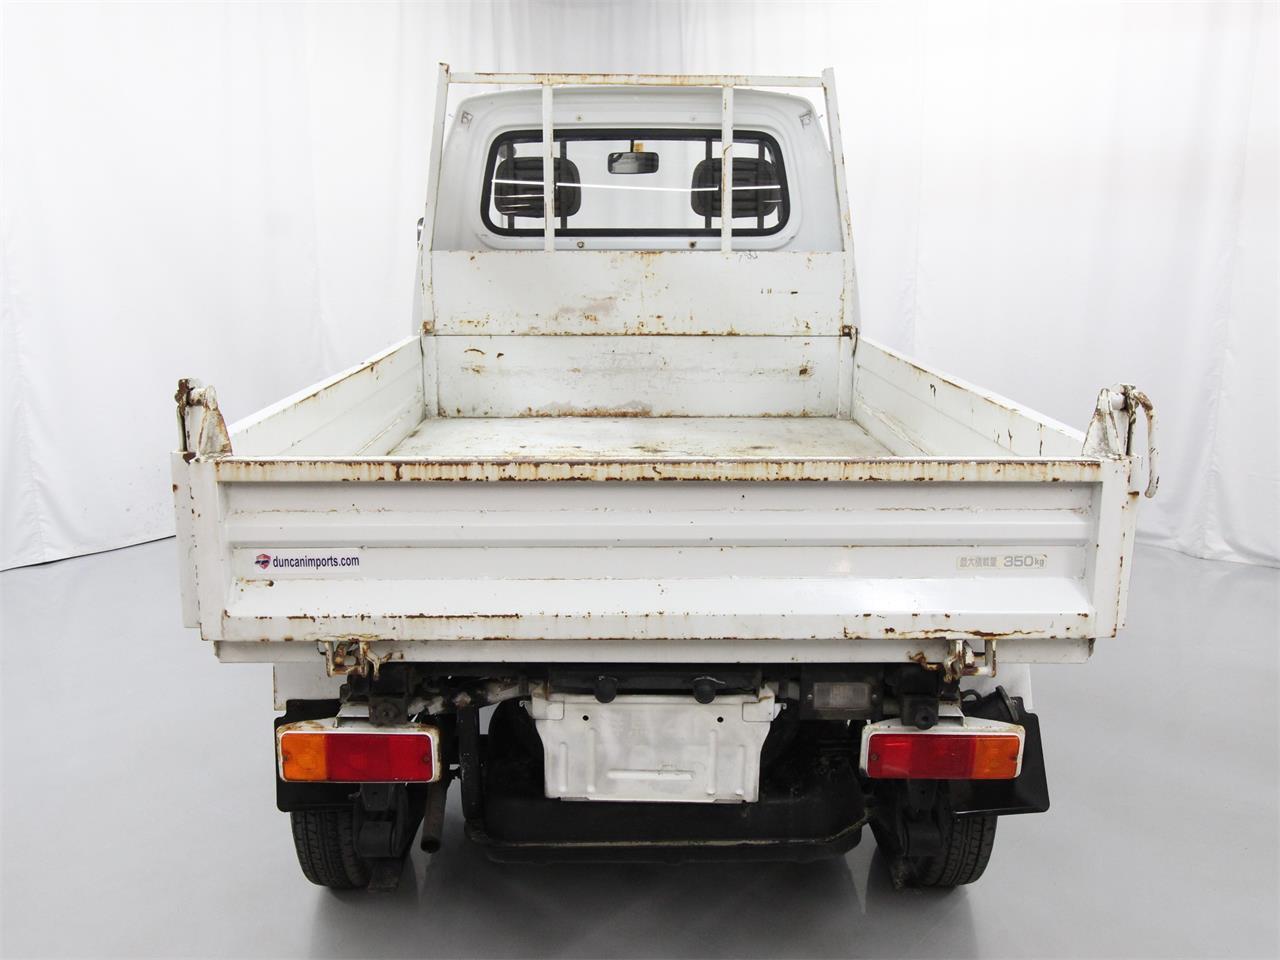 1989 Suzuki Carry (CC-1329454) for sale in Christiansburg, Virginia